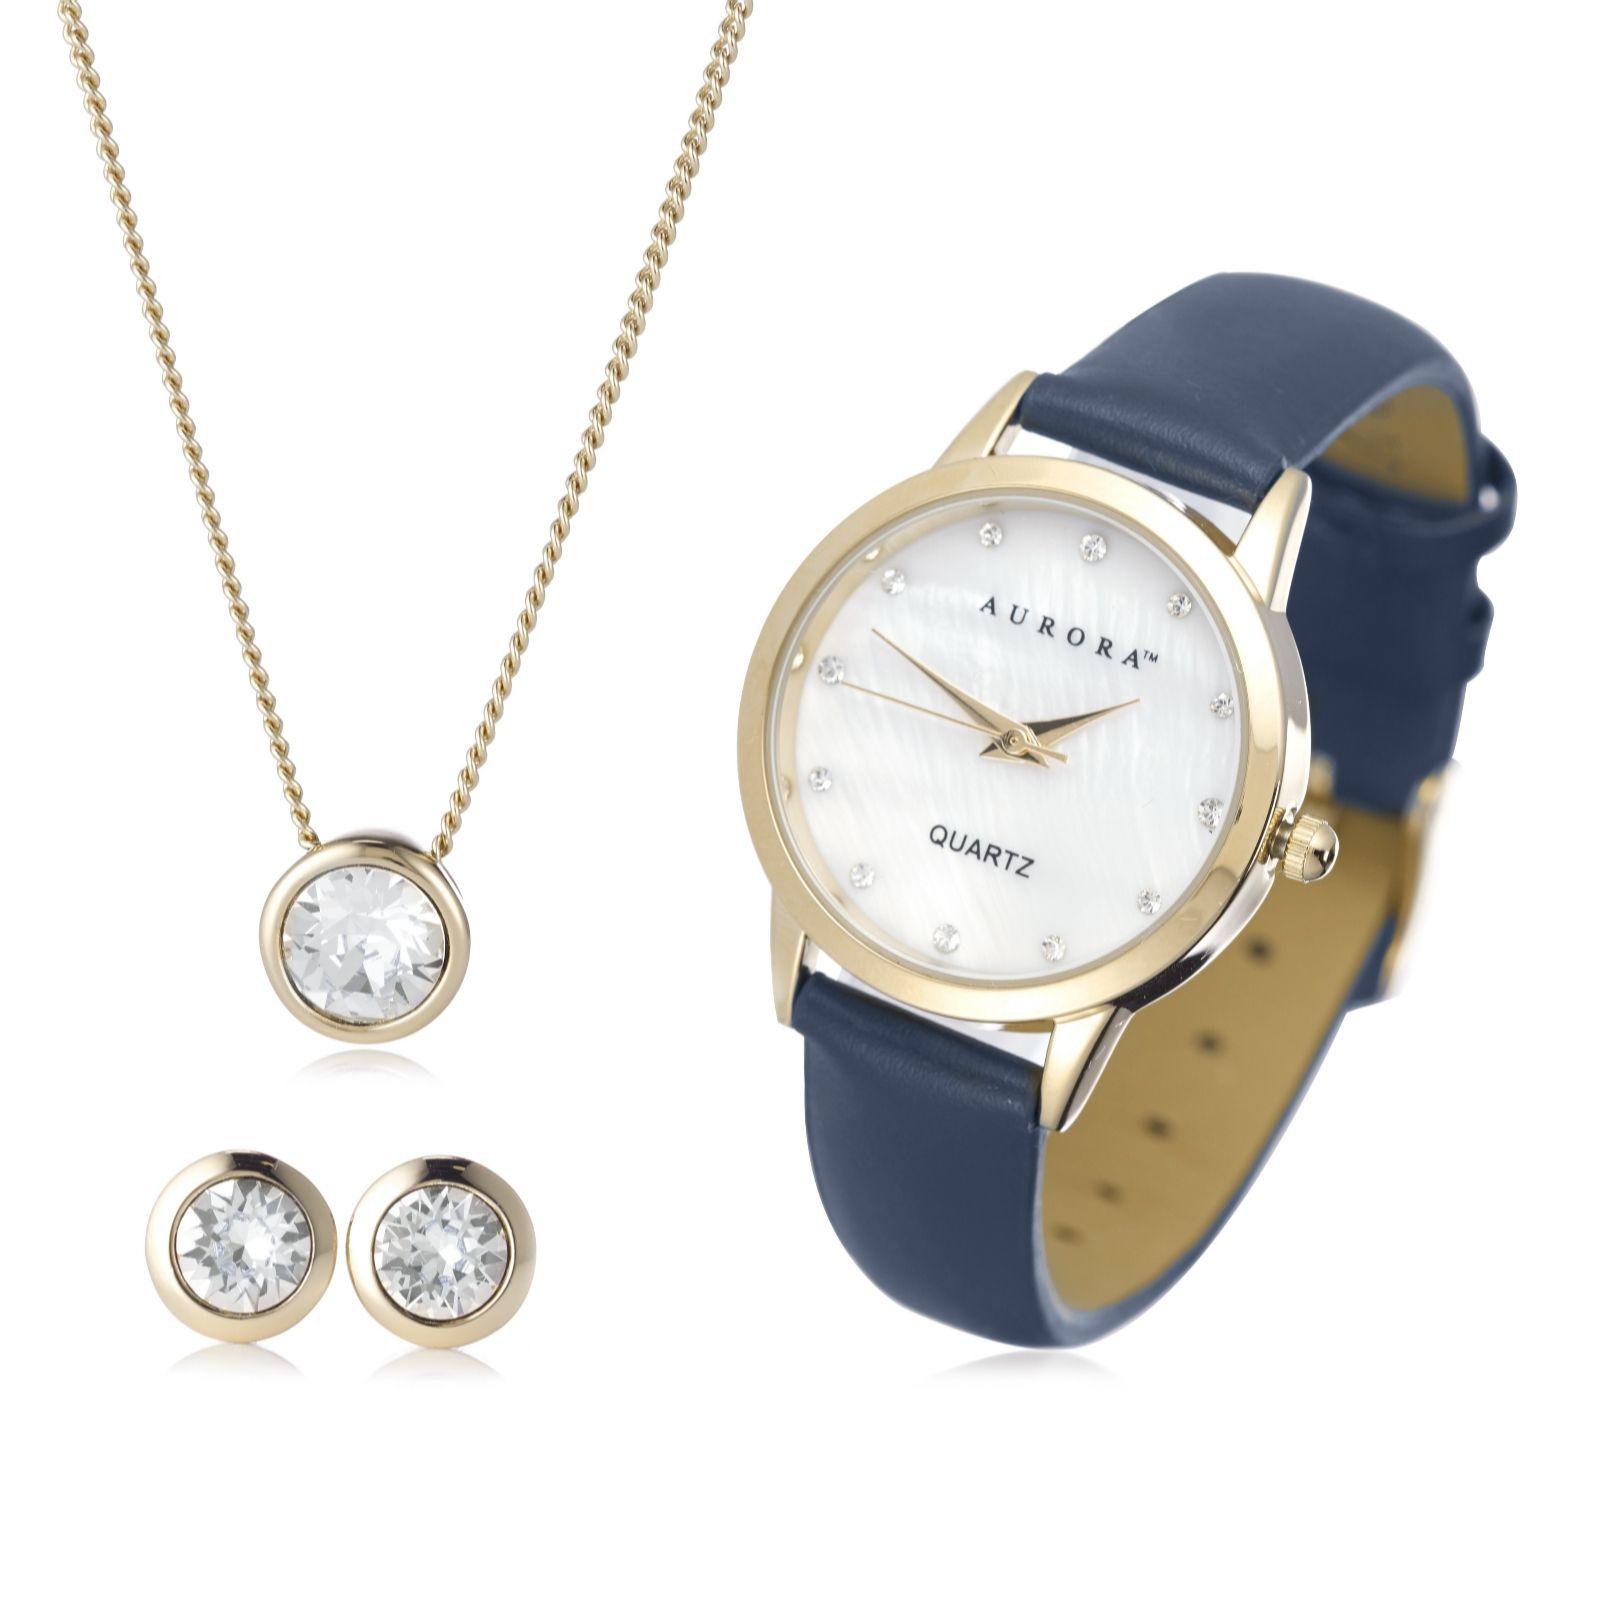 Aurora Swarovski Crystal Watch, Earrings & Necklace Gift Set ...